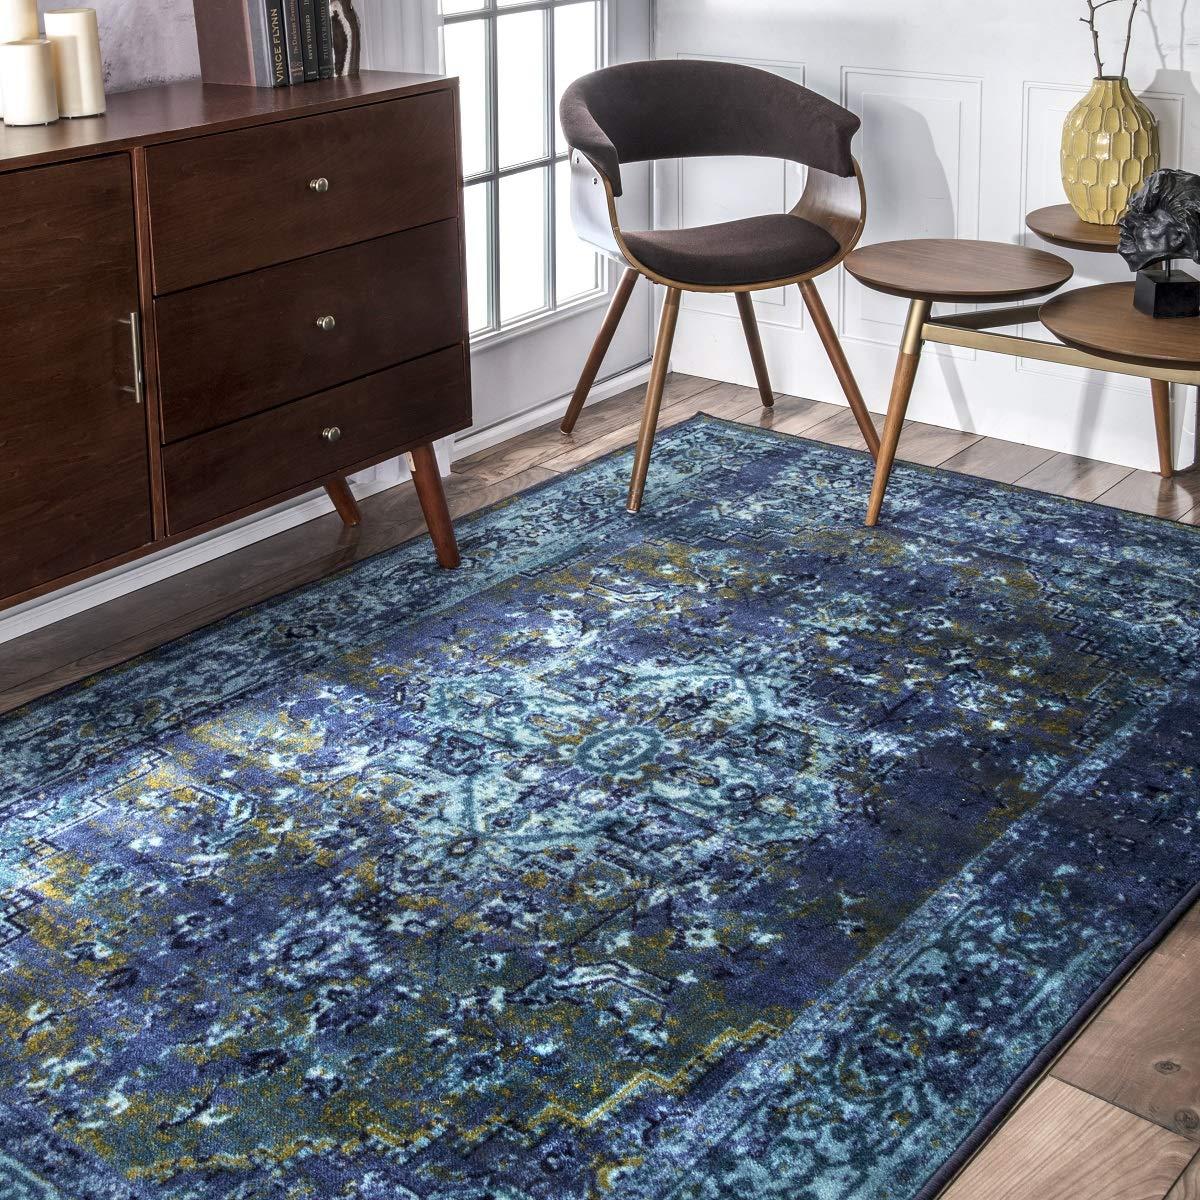 nuLOOM 200MCGZ01C-508 Reiko Vintage Persian Area Rug, 5 x 8 , Blue